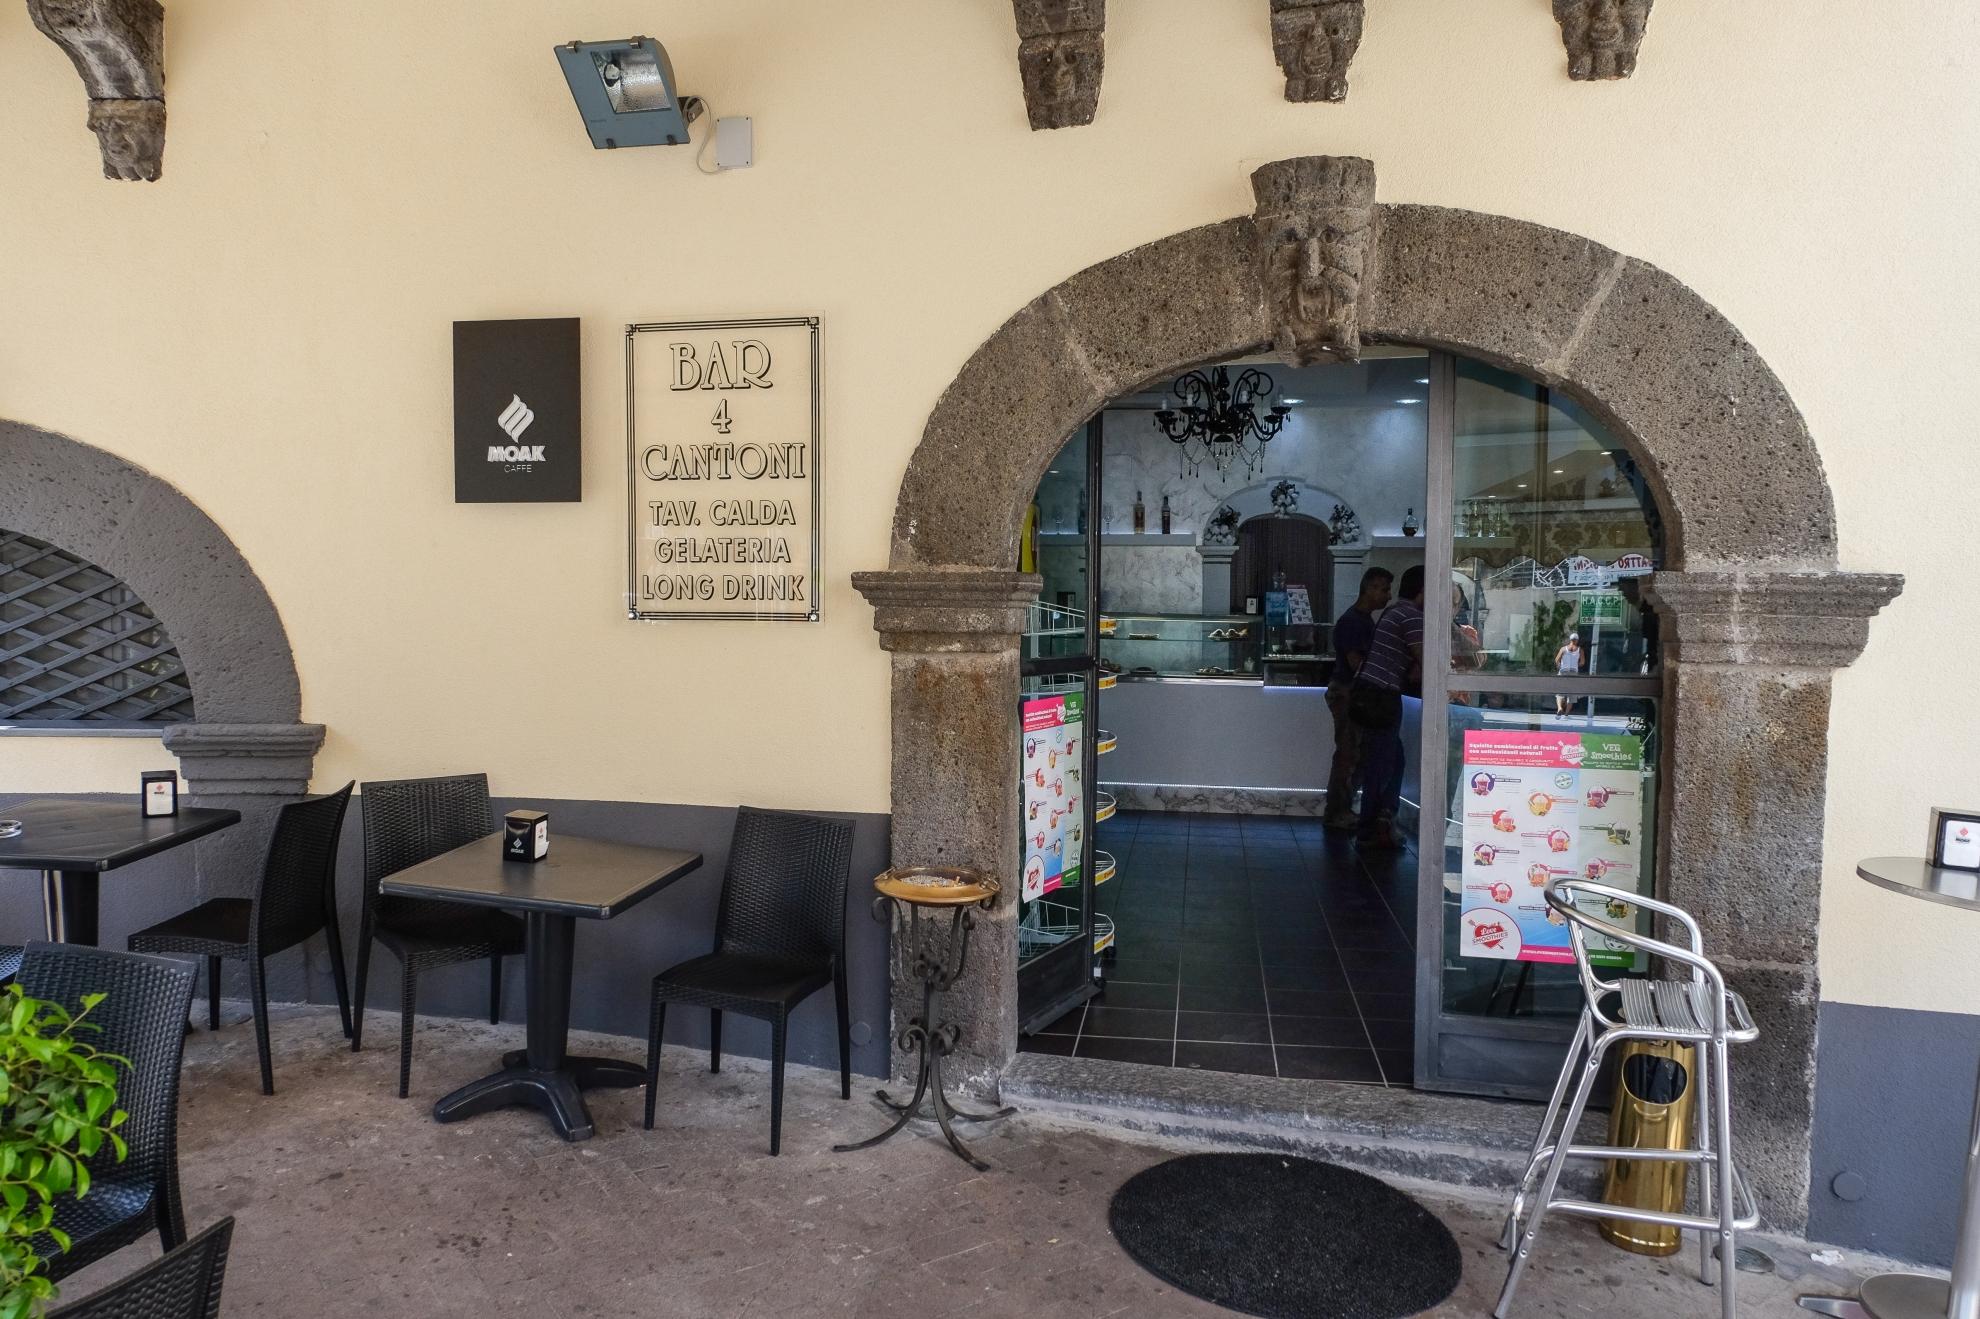 Bar 4 Cantoni - Bar, Aci Sant'Antonio